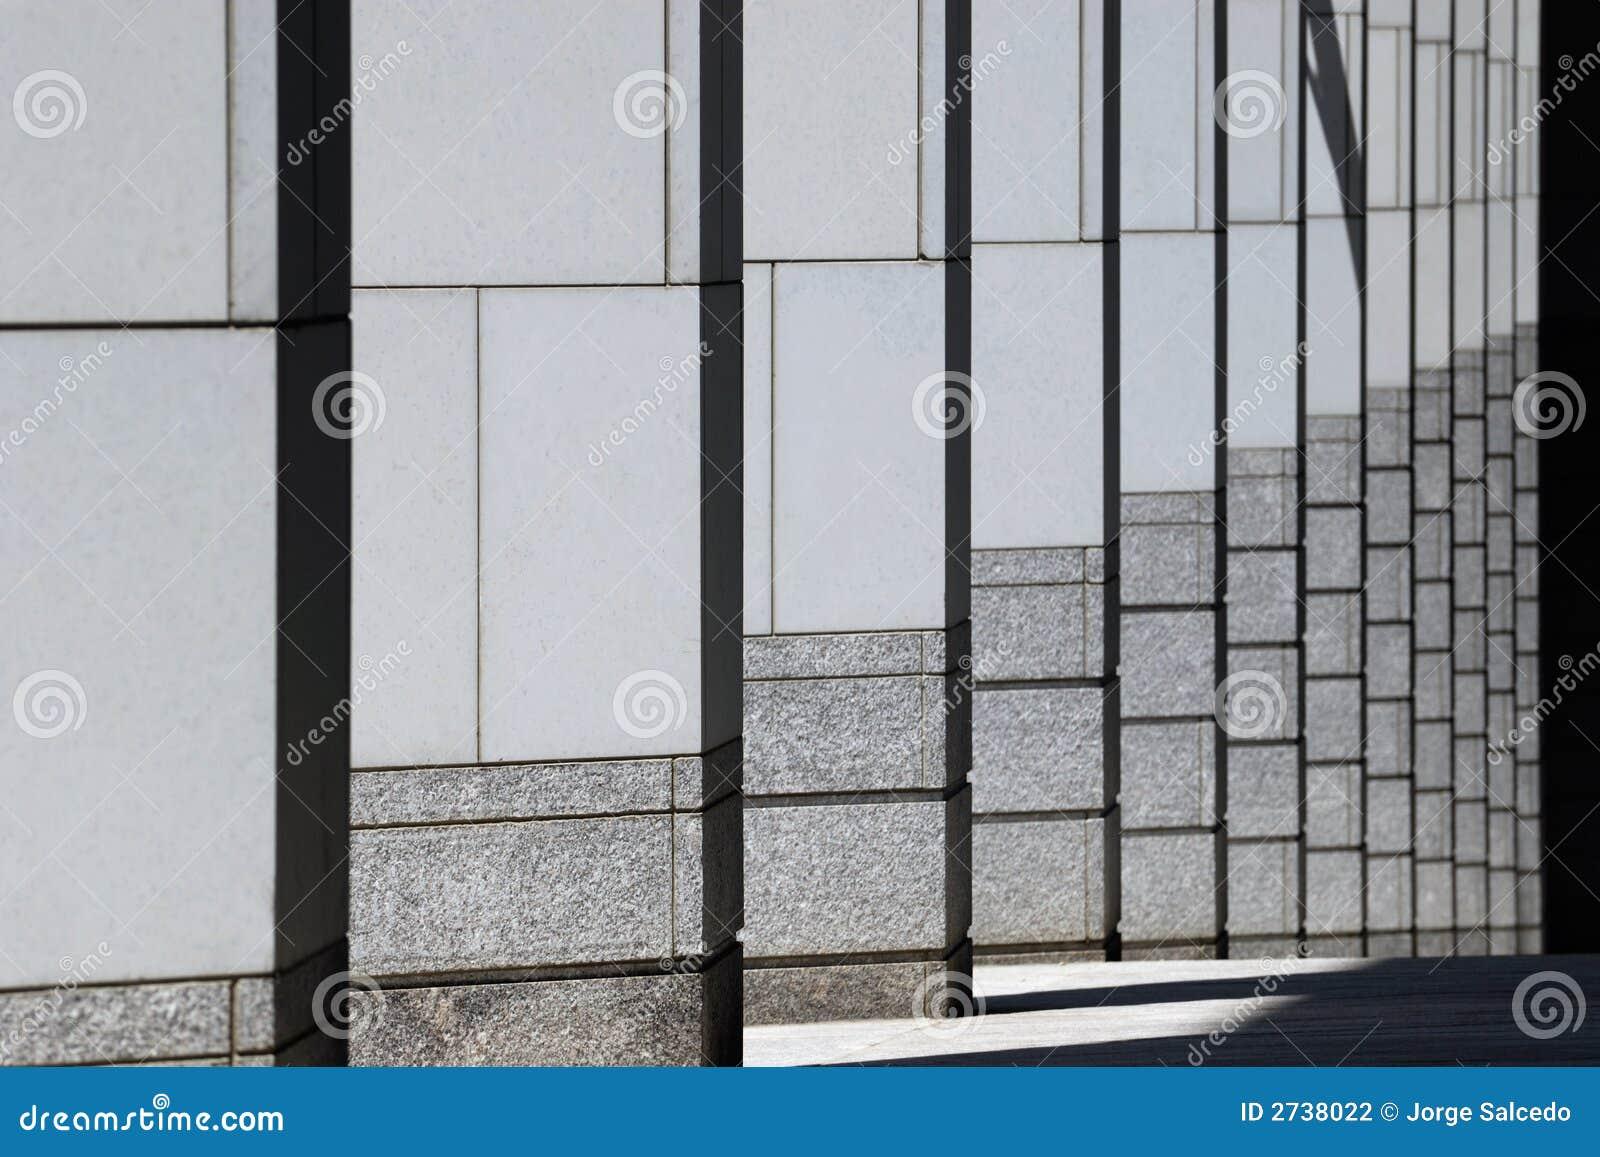 Modern Columns modern columns pattern stock photography - image: 2738022